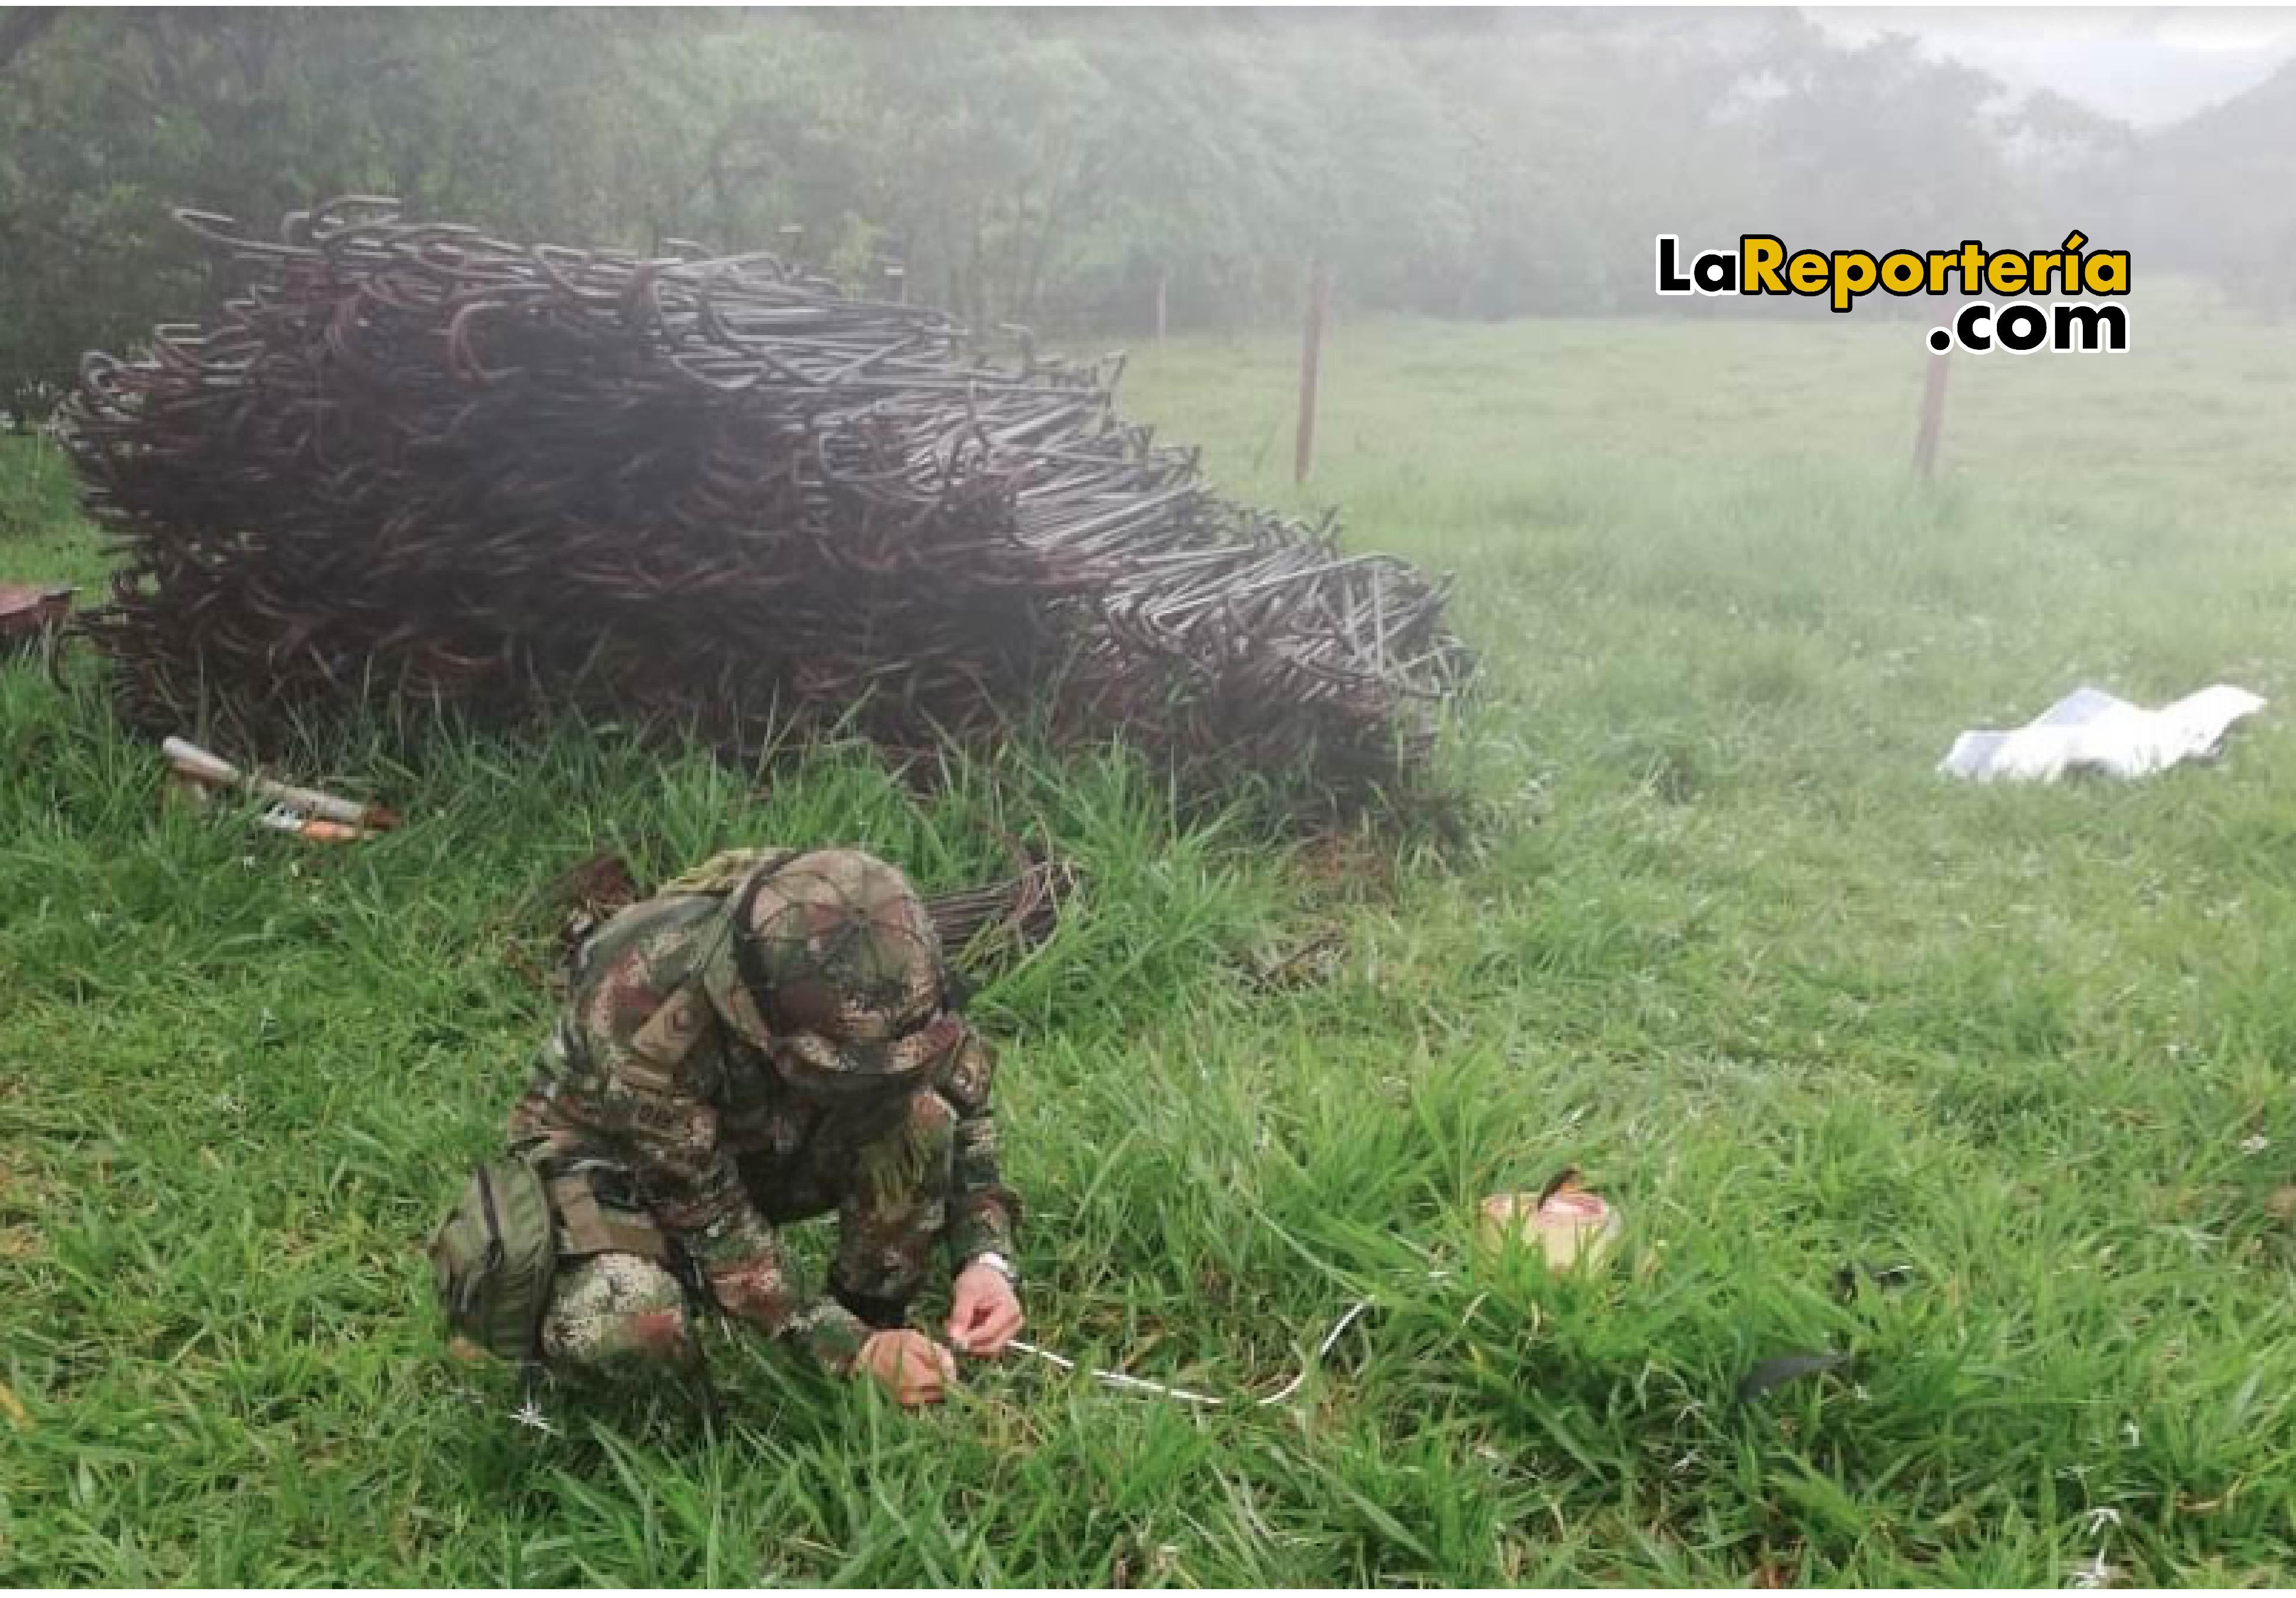 Ejército Nacional destruyó controladamente artefacto explosivo.